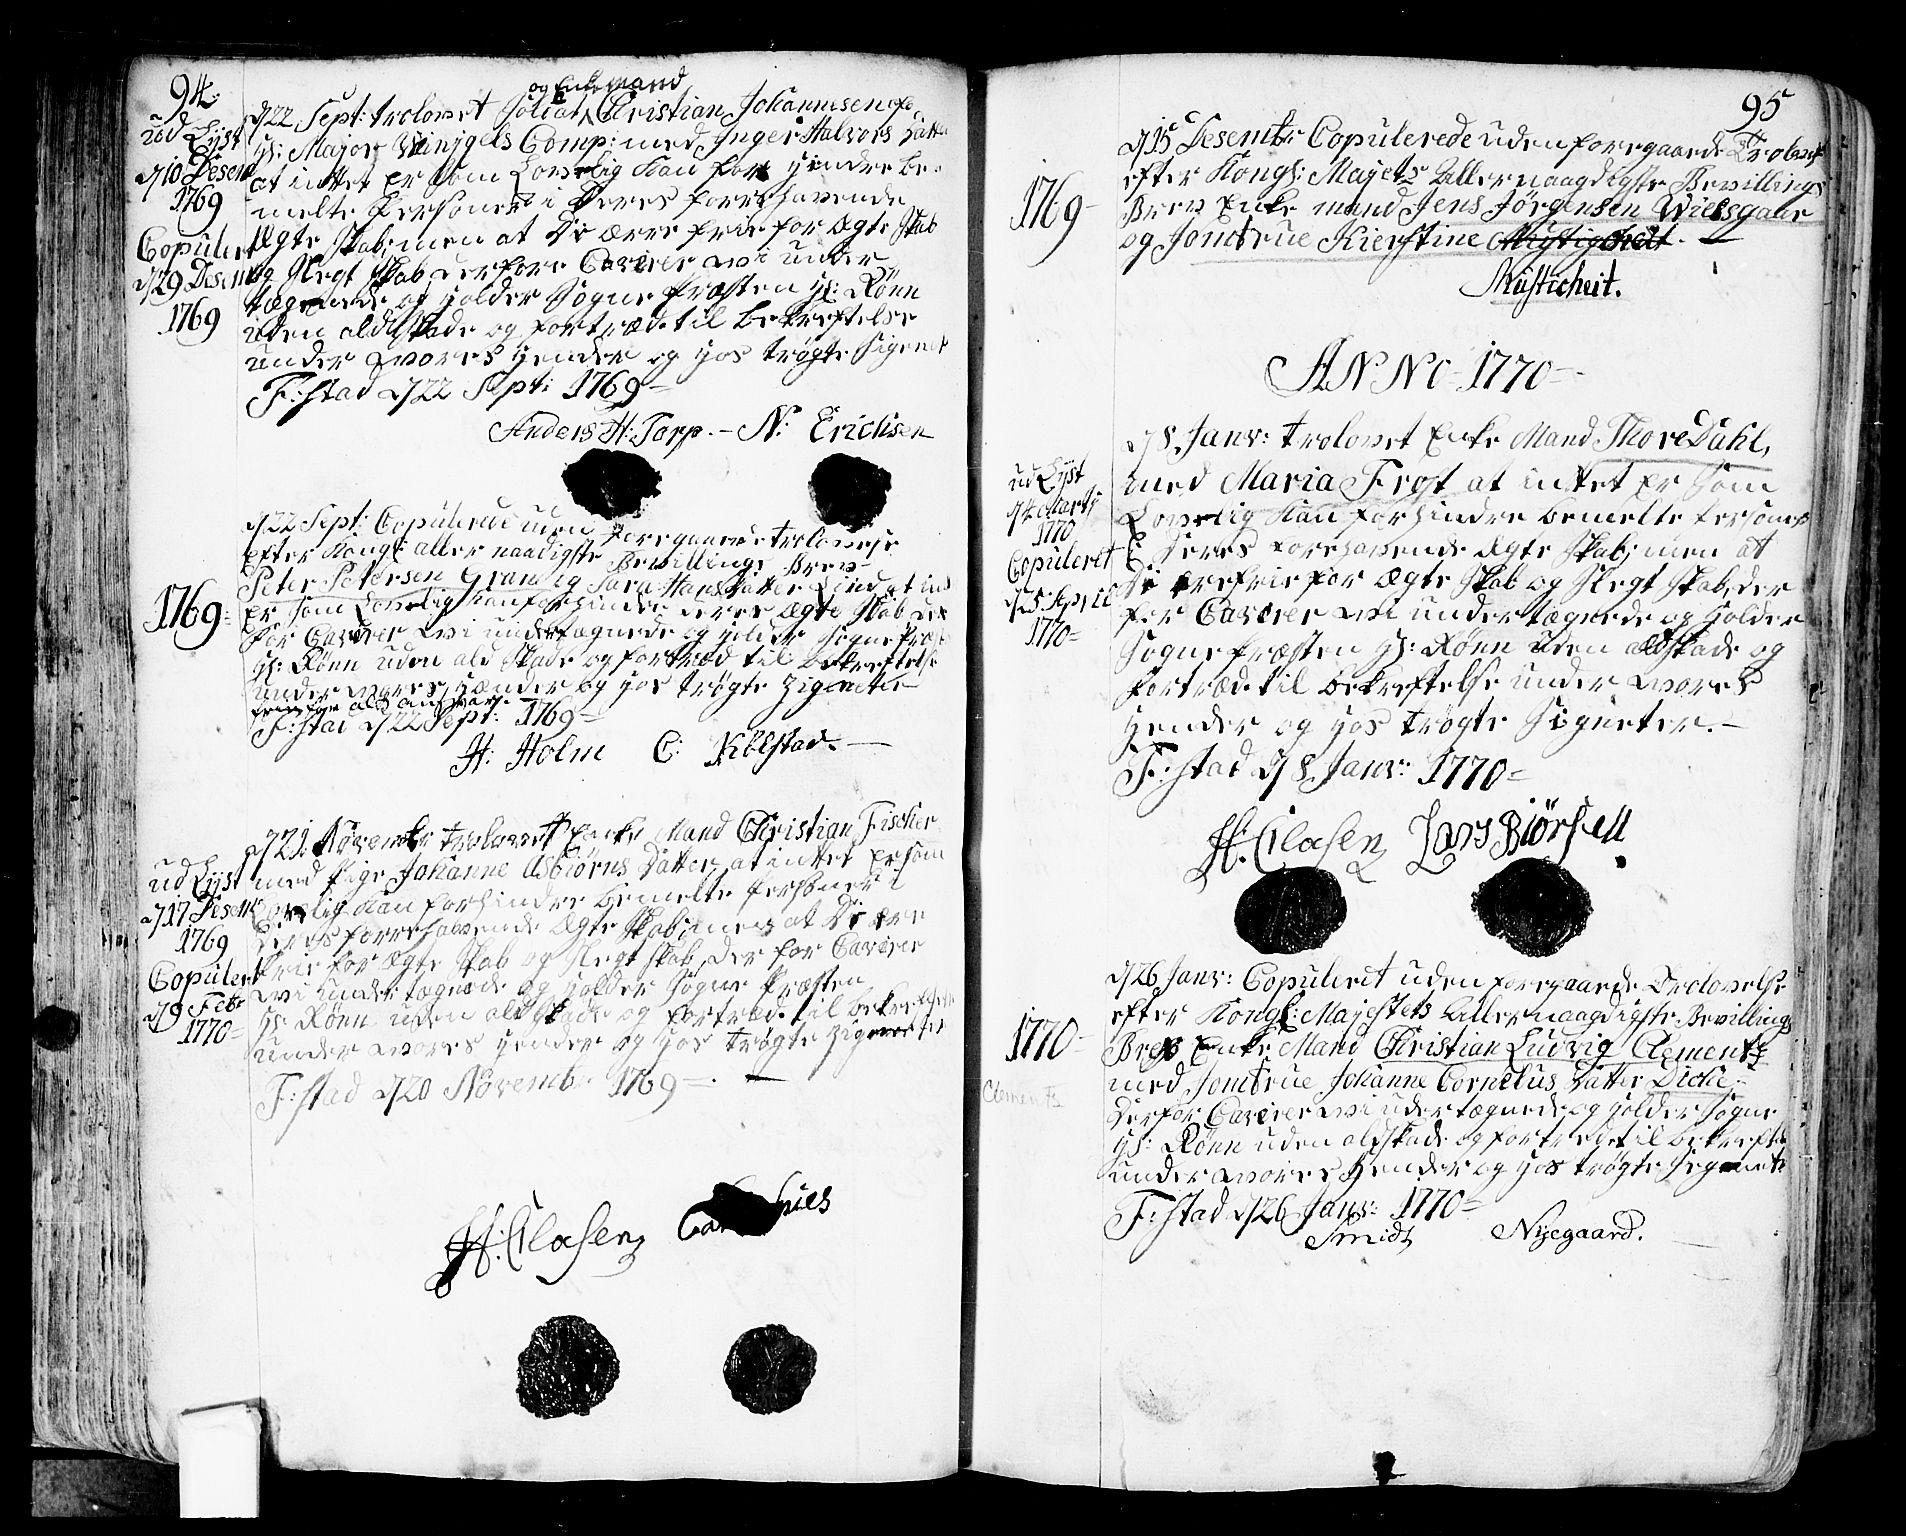 SAO, Fredrikstad prestekontor Kirkebøker, F/Fa/L0002: Ministerialbok nr. 2, 1750-1804, s. 94-95